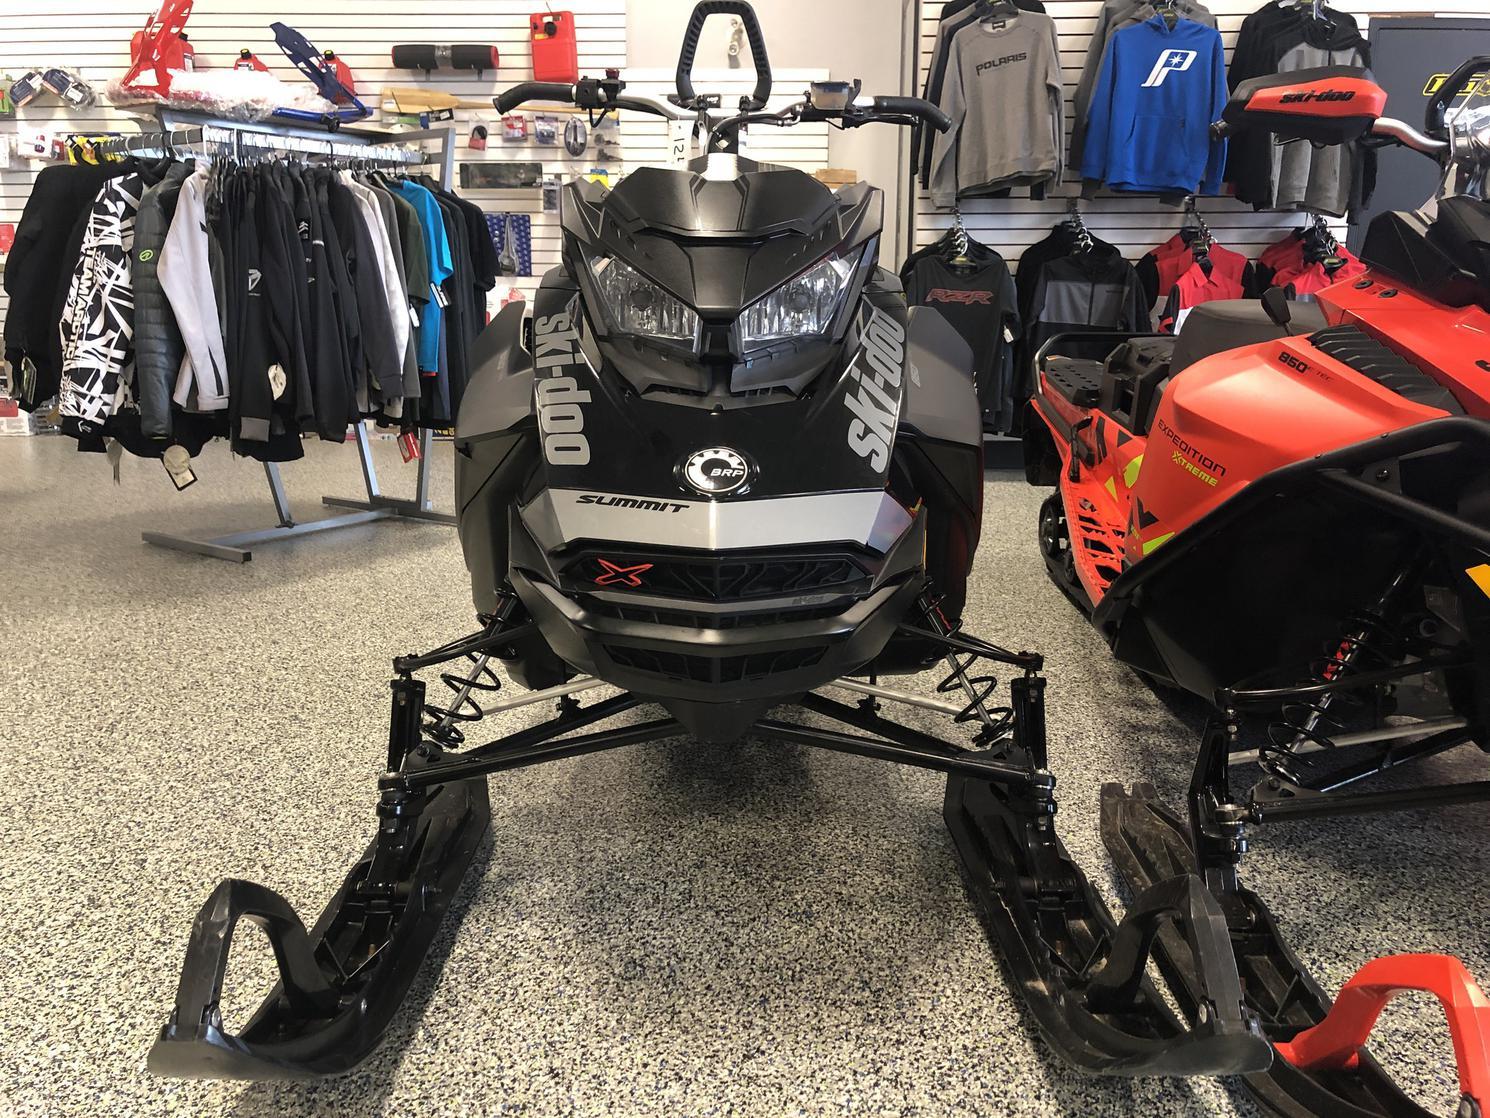 2020 Ski-Doo SUMMIT X 850 ETEC 154  2.6» garantie 5 ans disponible